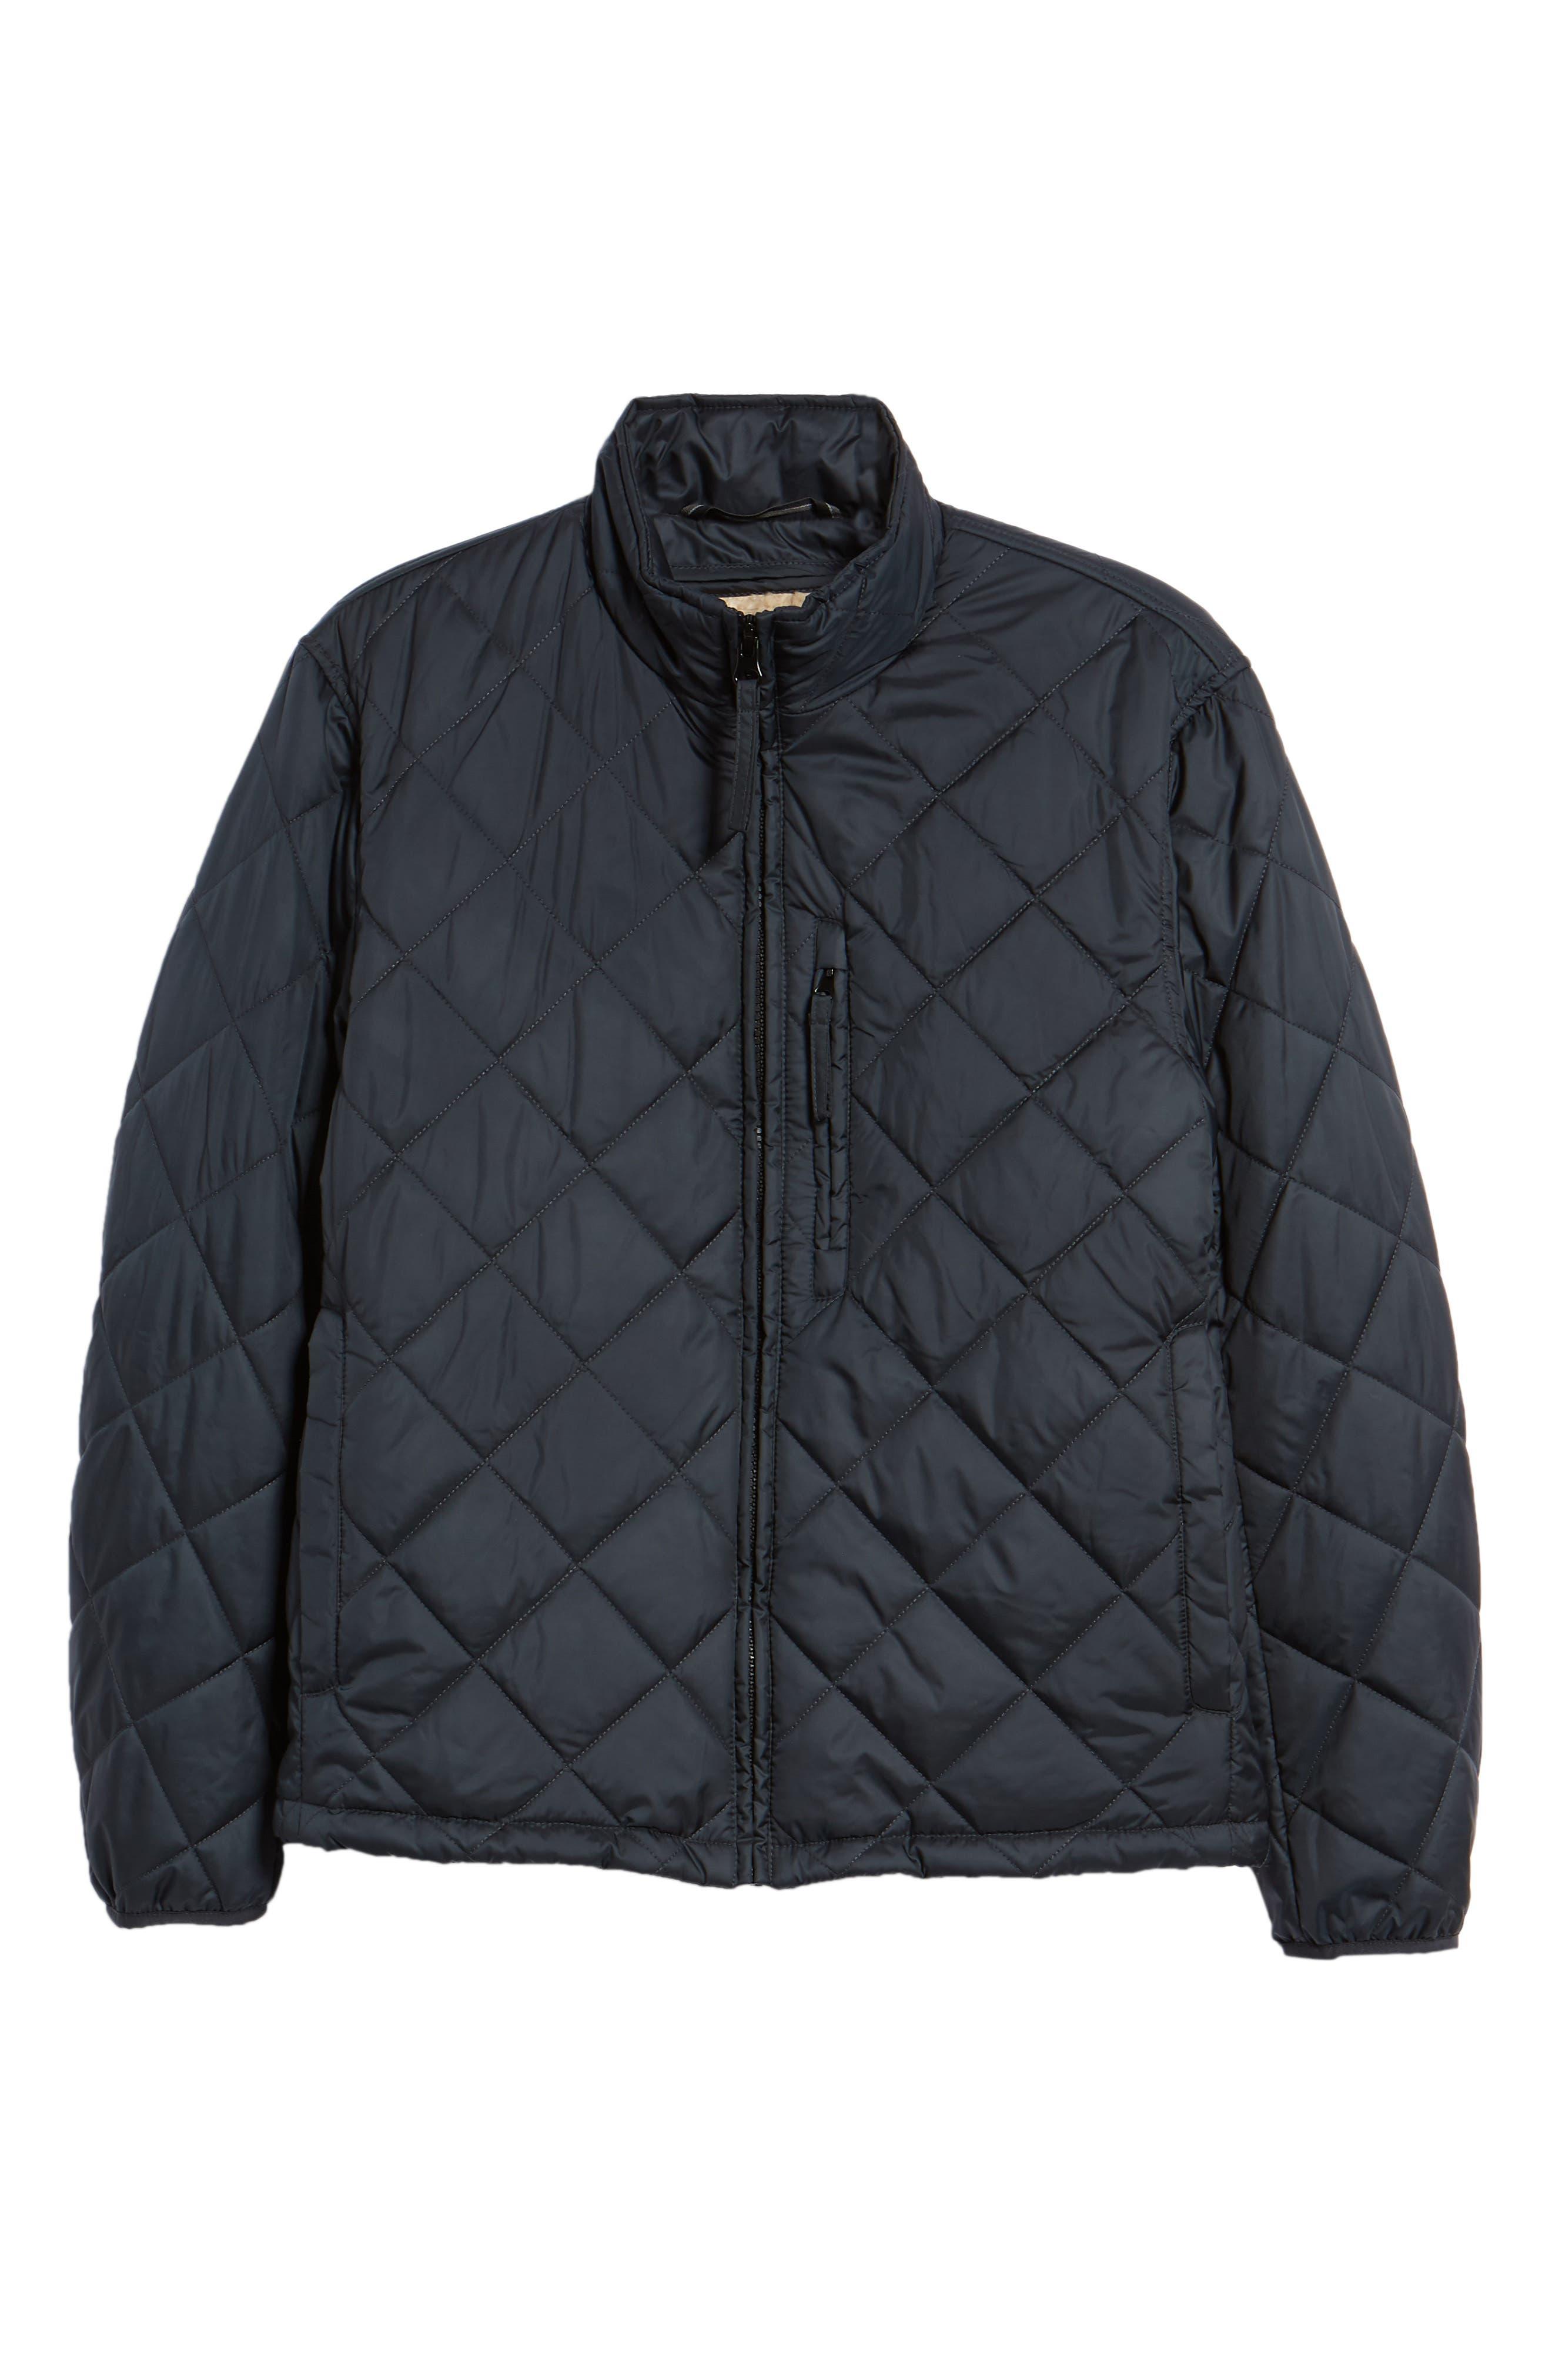 MARC NEW YORK, Humboldt Quilted Jacket, Alternate thumbnail 6, color, BLACK